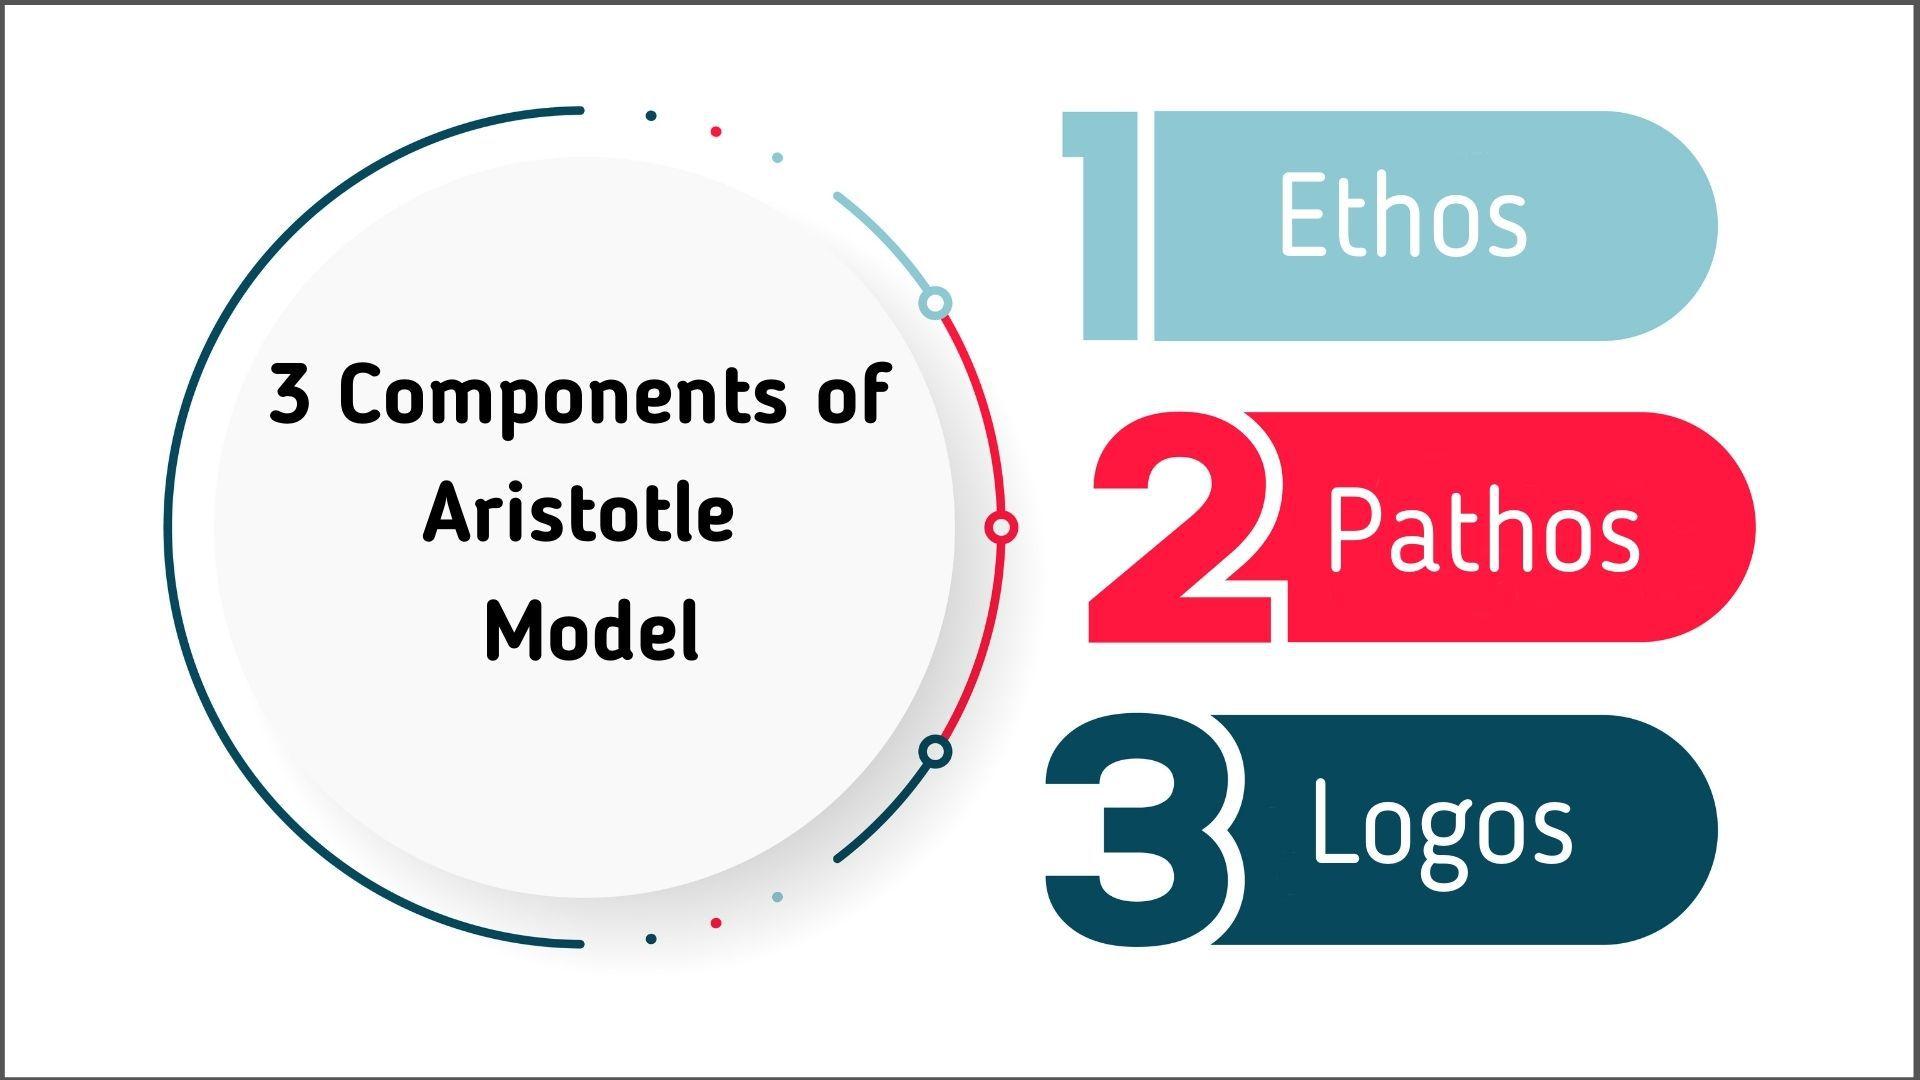 Three Components of Aristotle Model